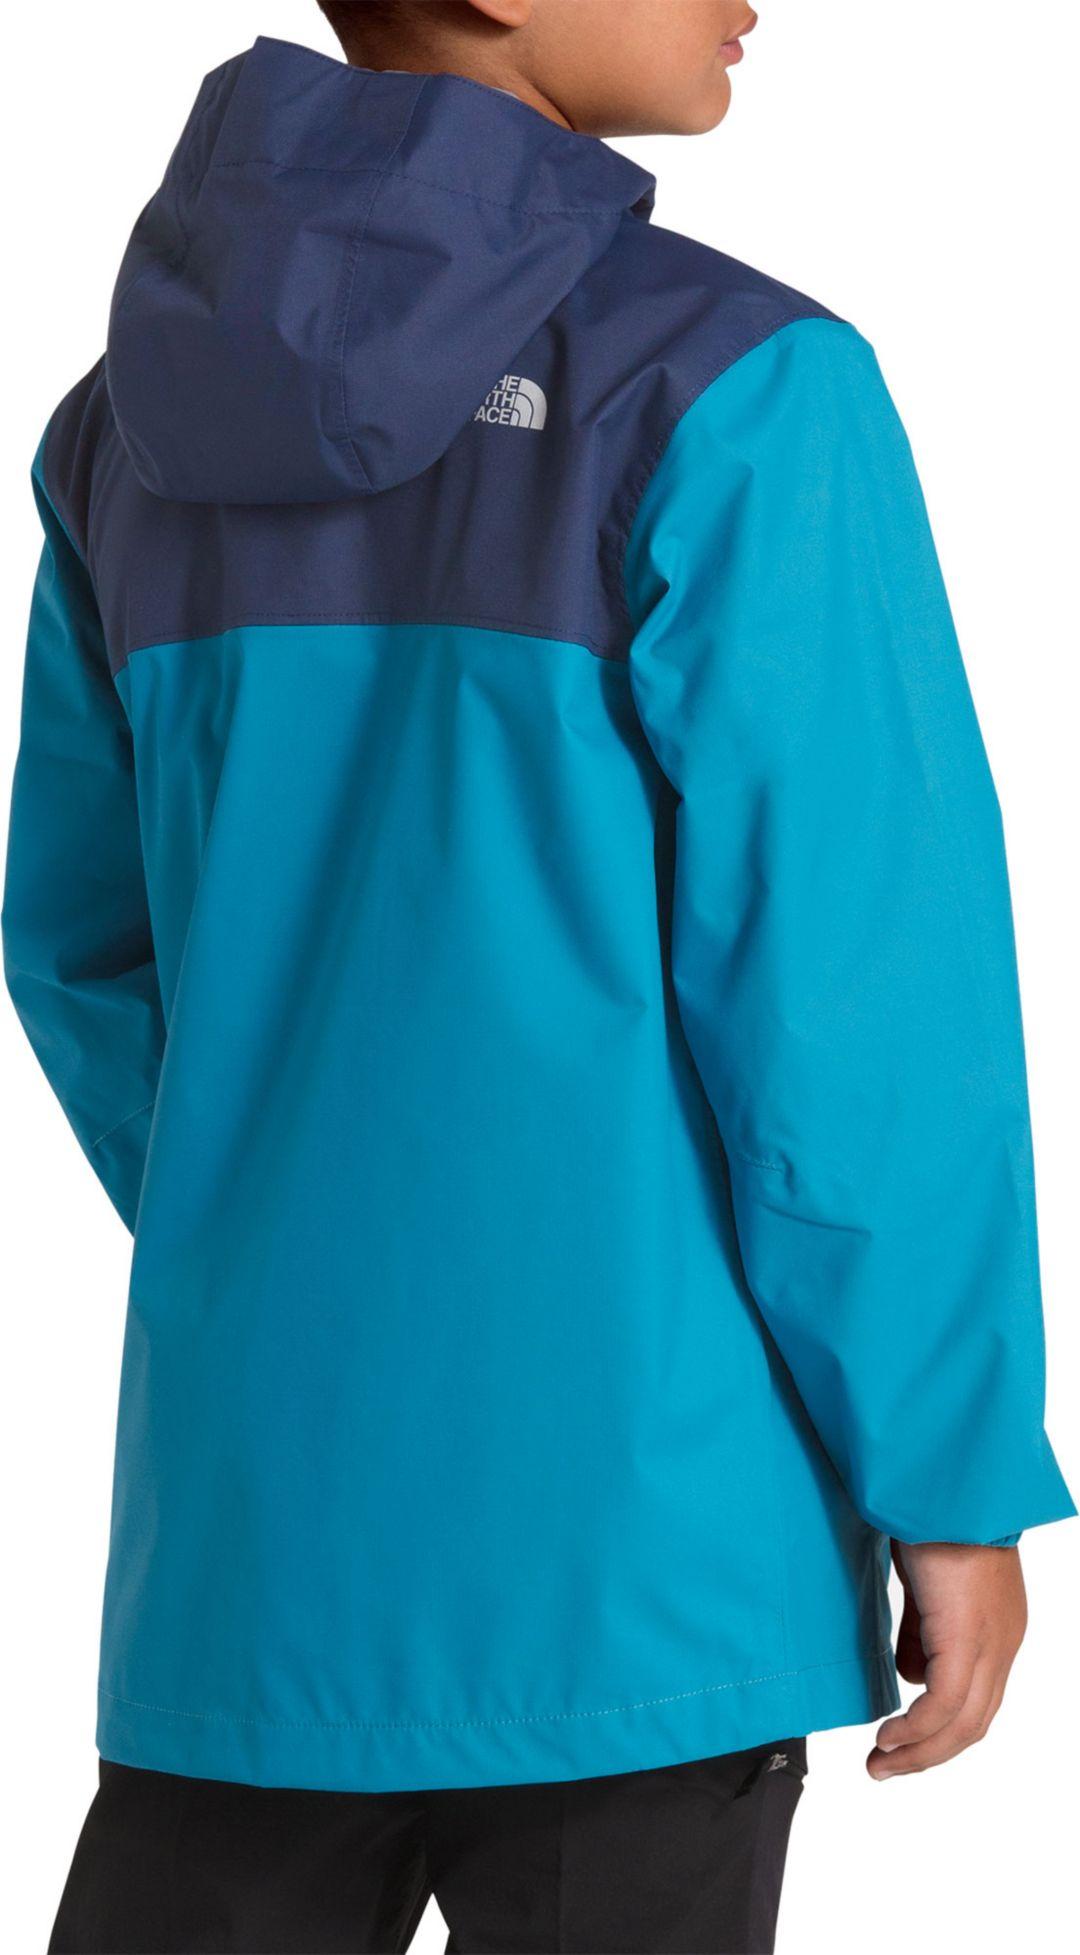 e21c6e775 The North Face Boys' Resolve Reflective Jacket